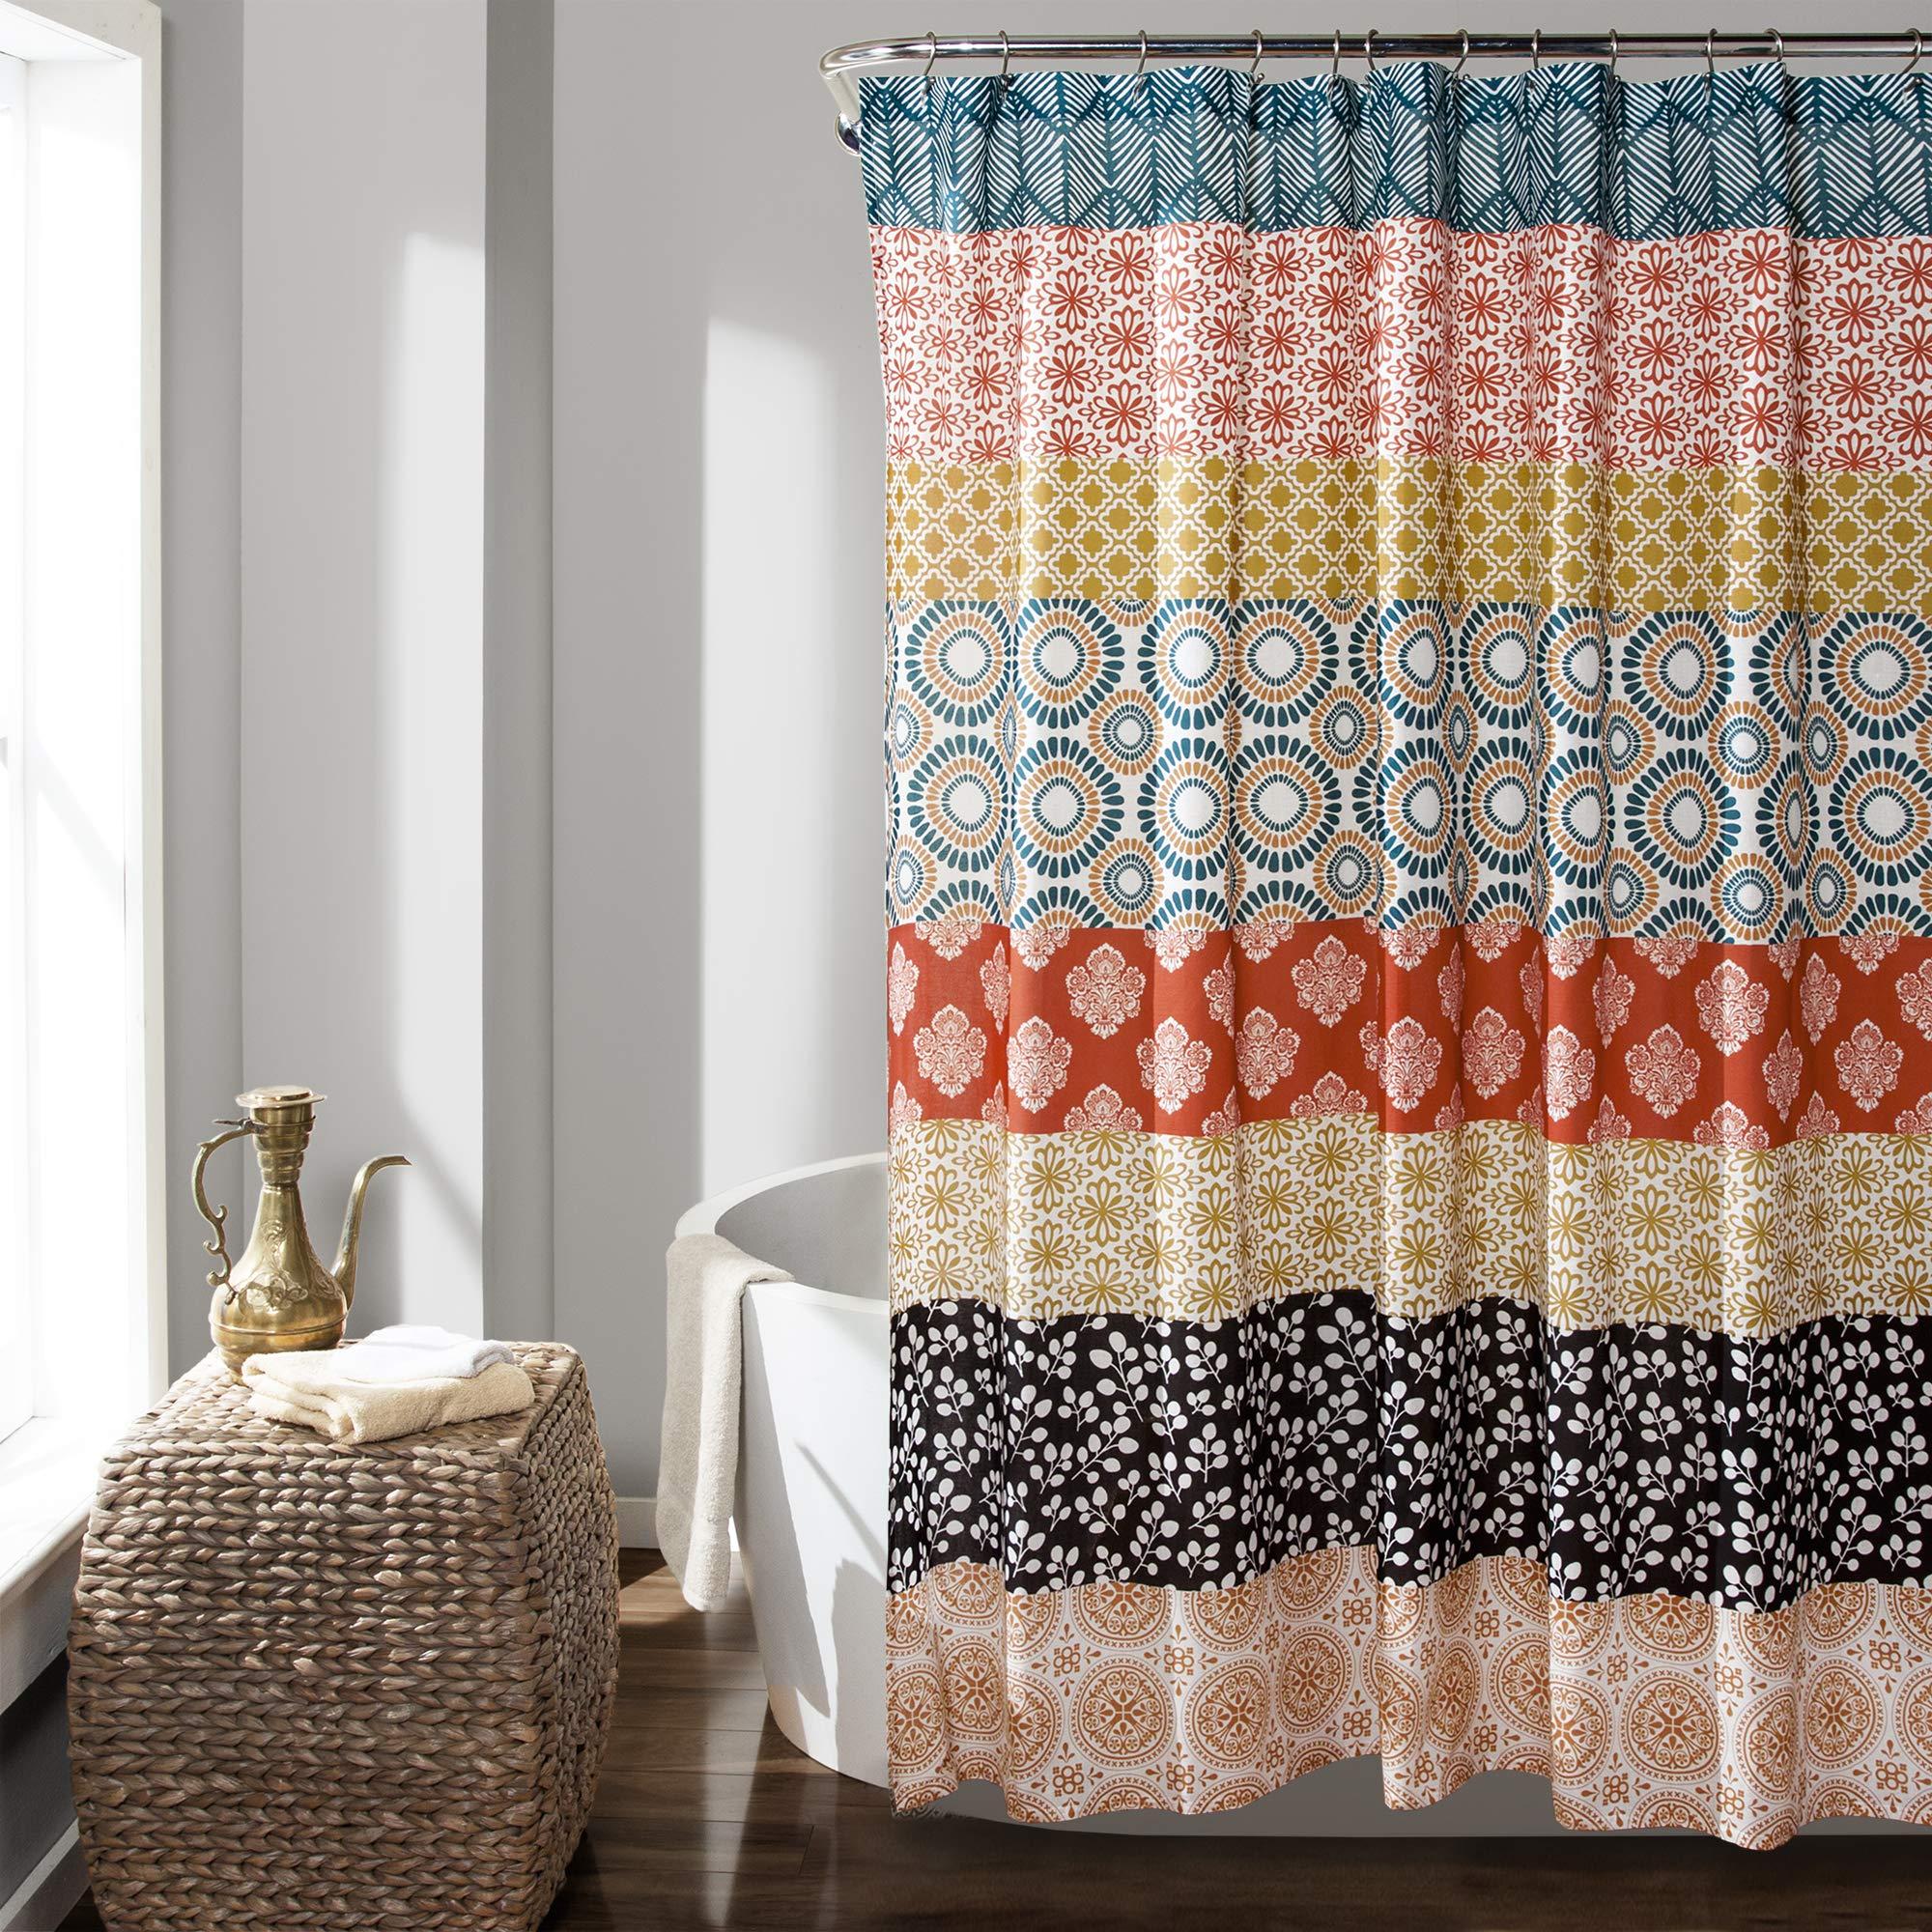 Lush Decor Bohemian Striped Shower Curtain Colorful Bold Design, 72'' x 72'', Turquoise and Orange by Lush Decor